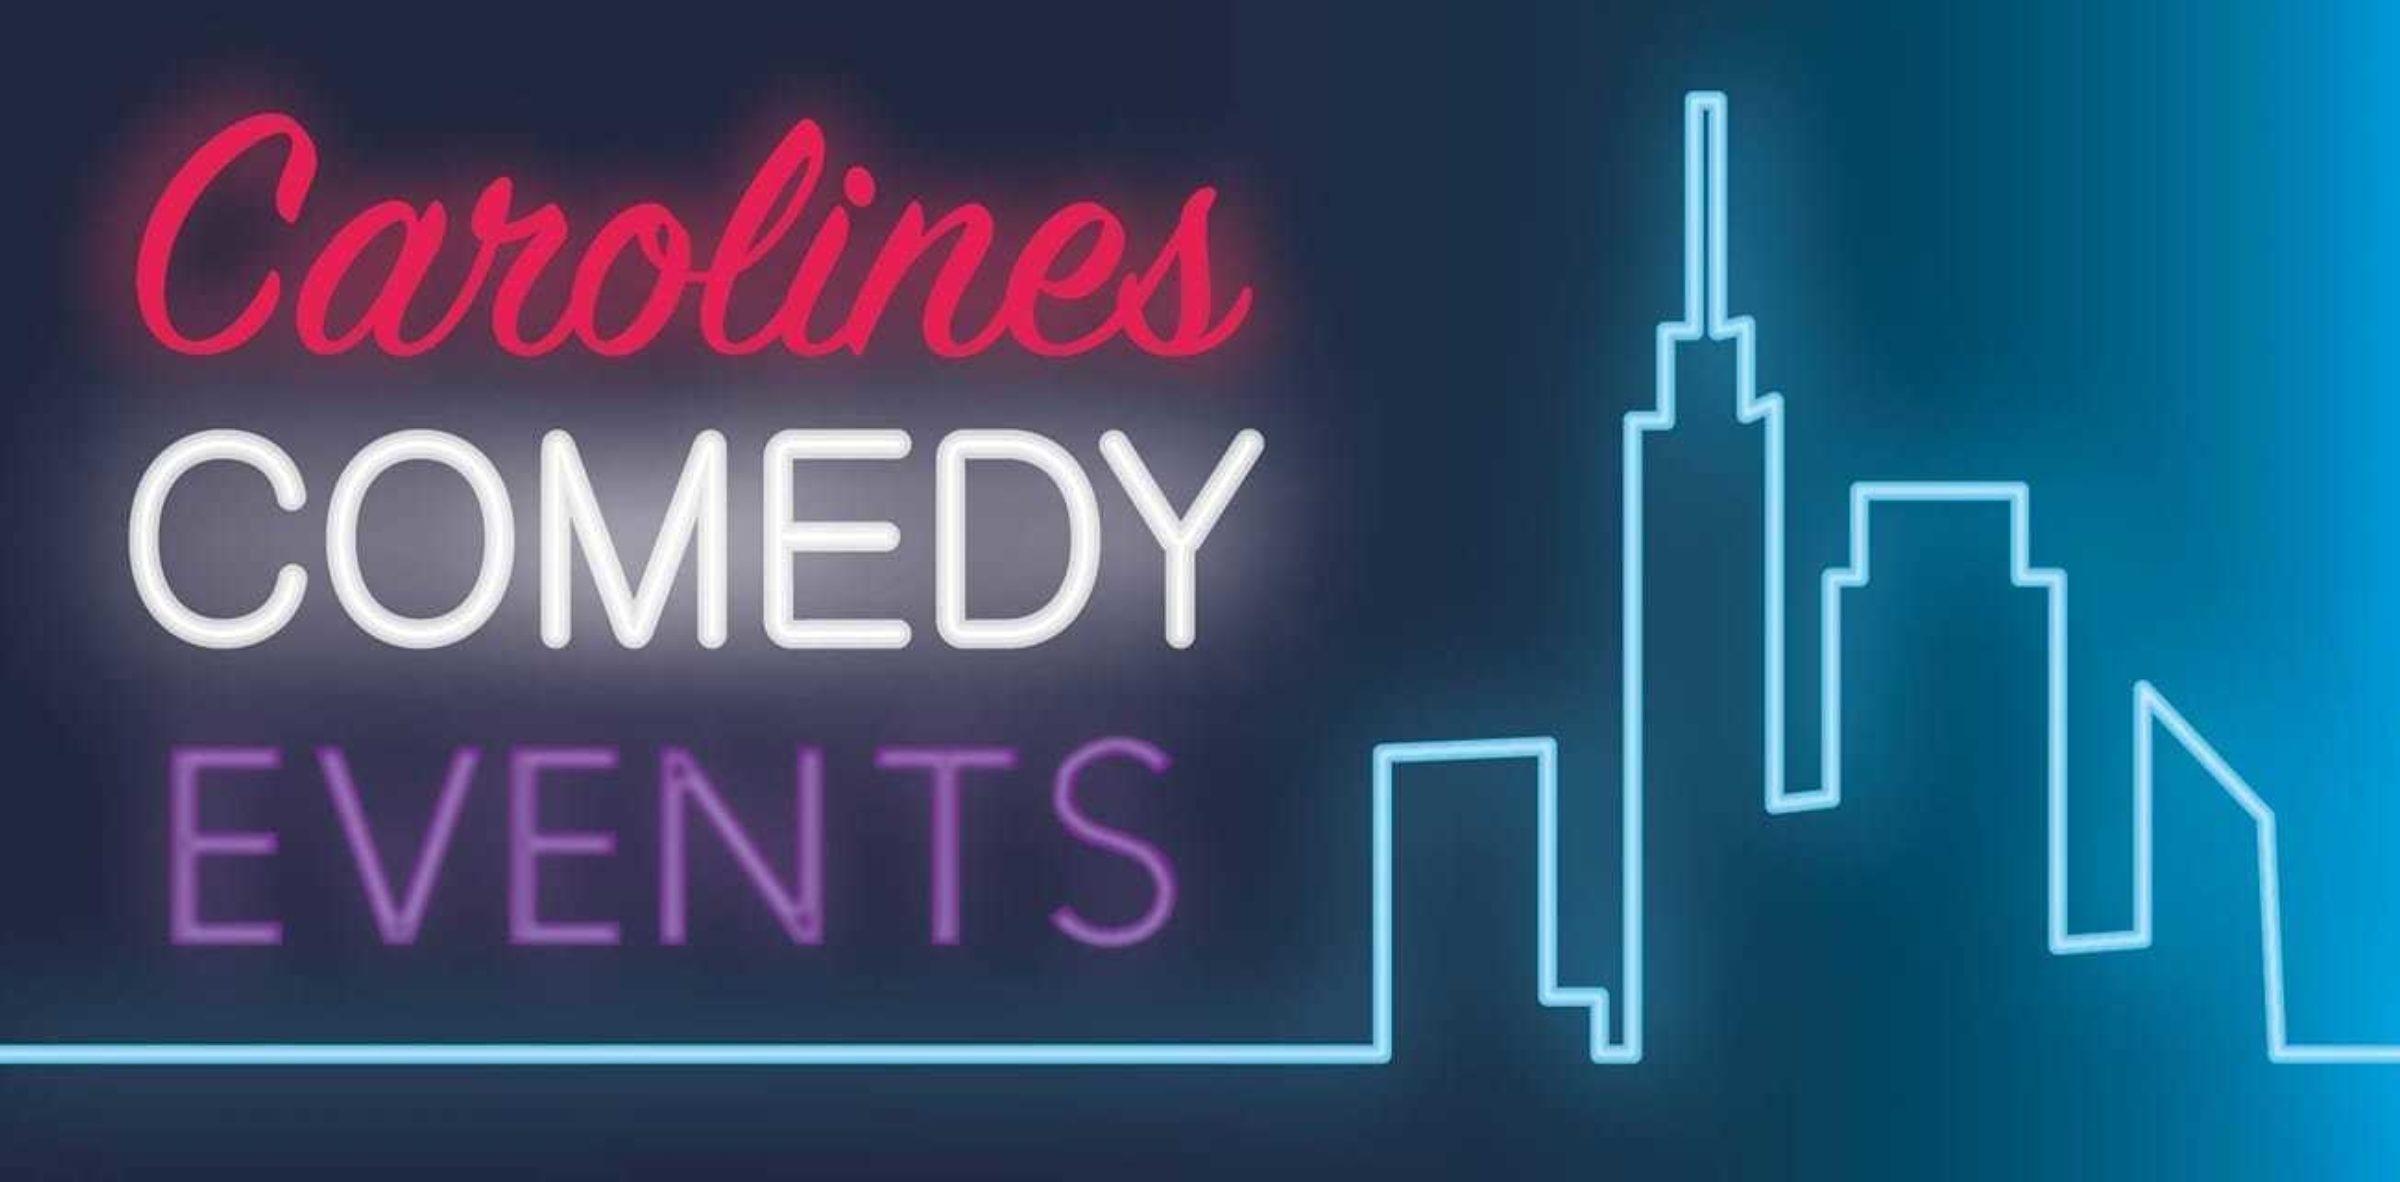 Comedy night 3498 1568800487 35hxodk7lk